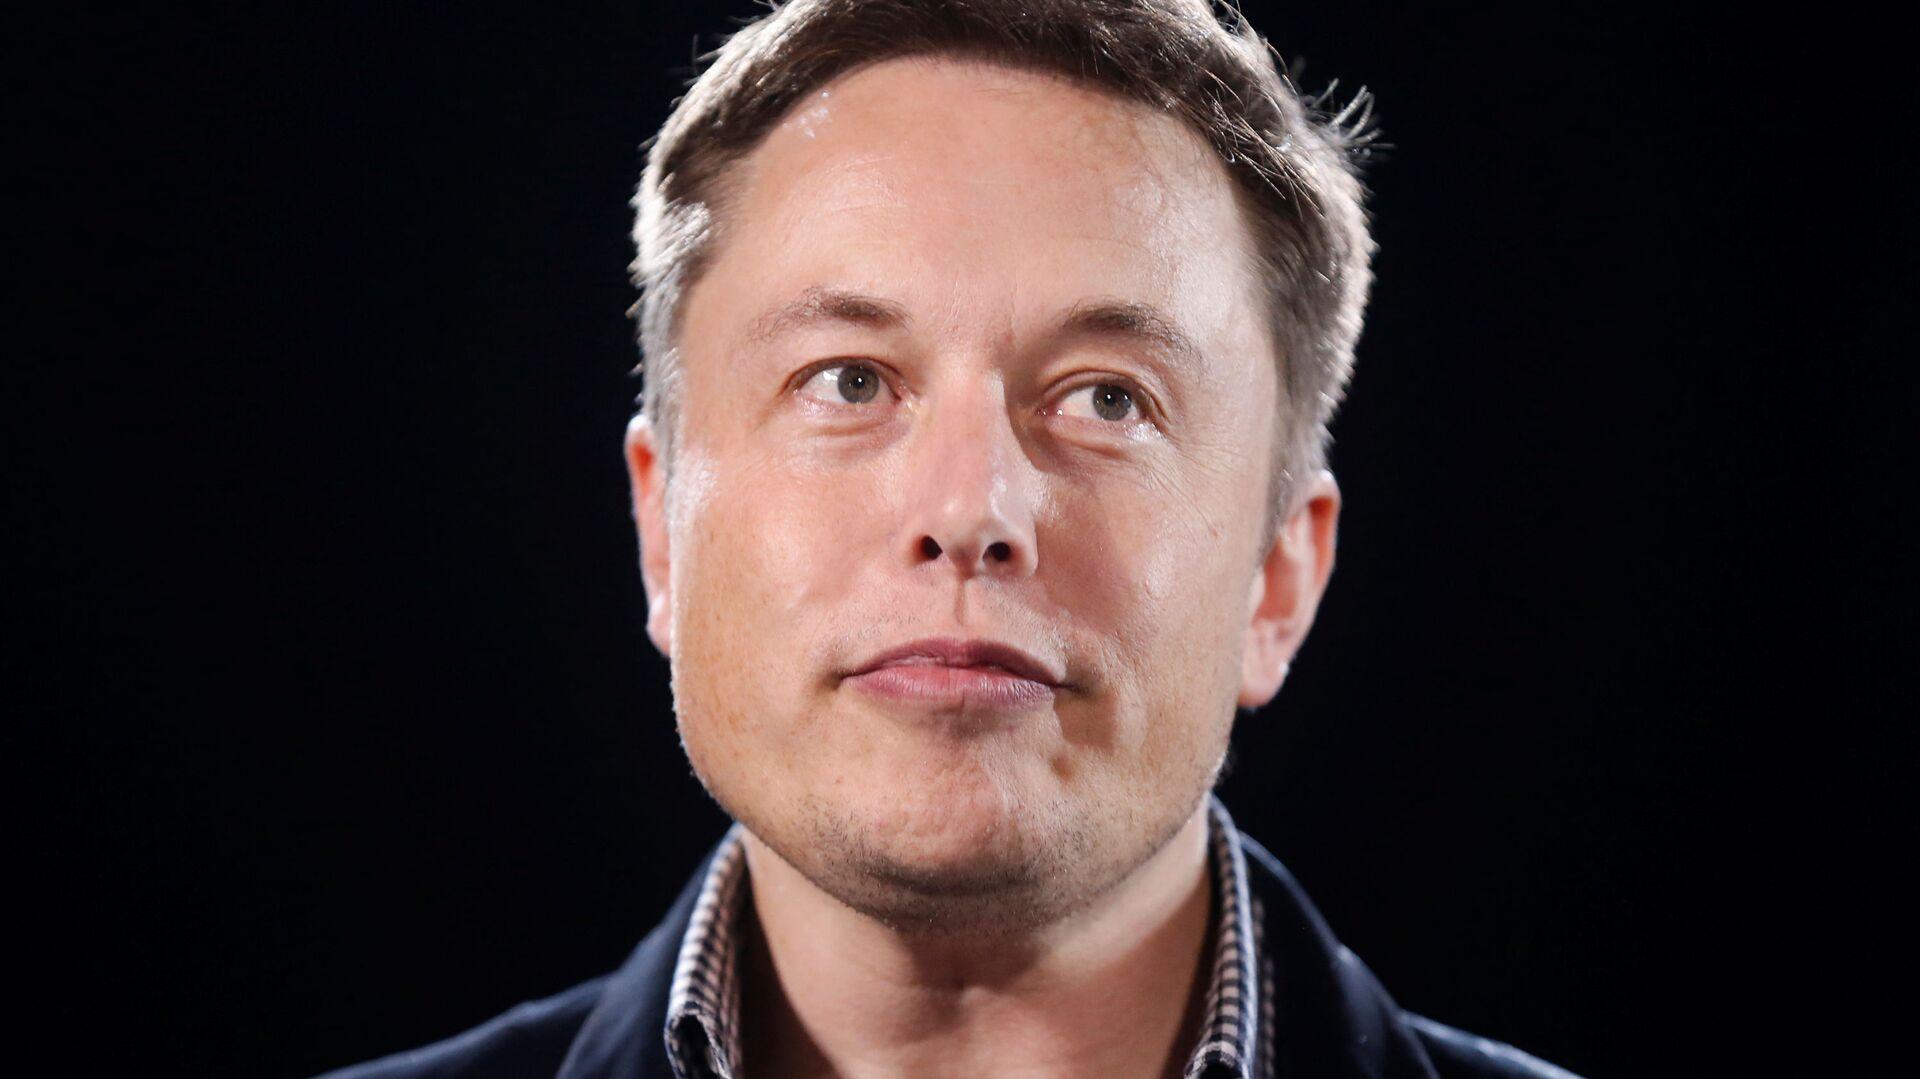 Elon Musk, director general de Tesla y SpaceX - Sputnik Mundo, 1920, 23.02.2021